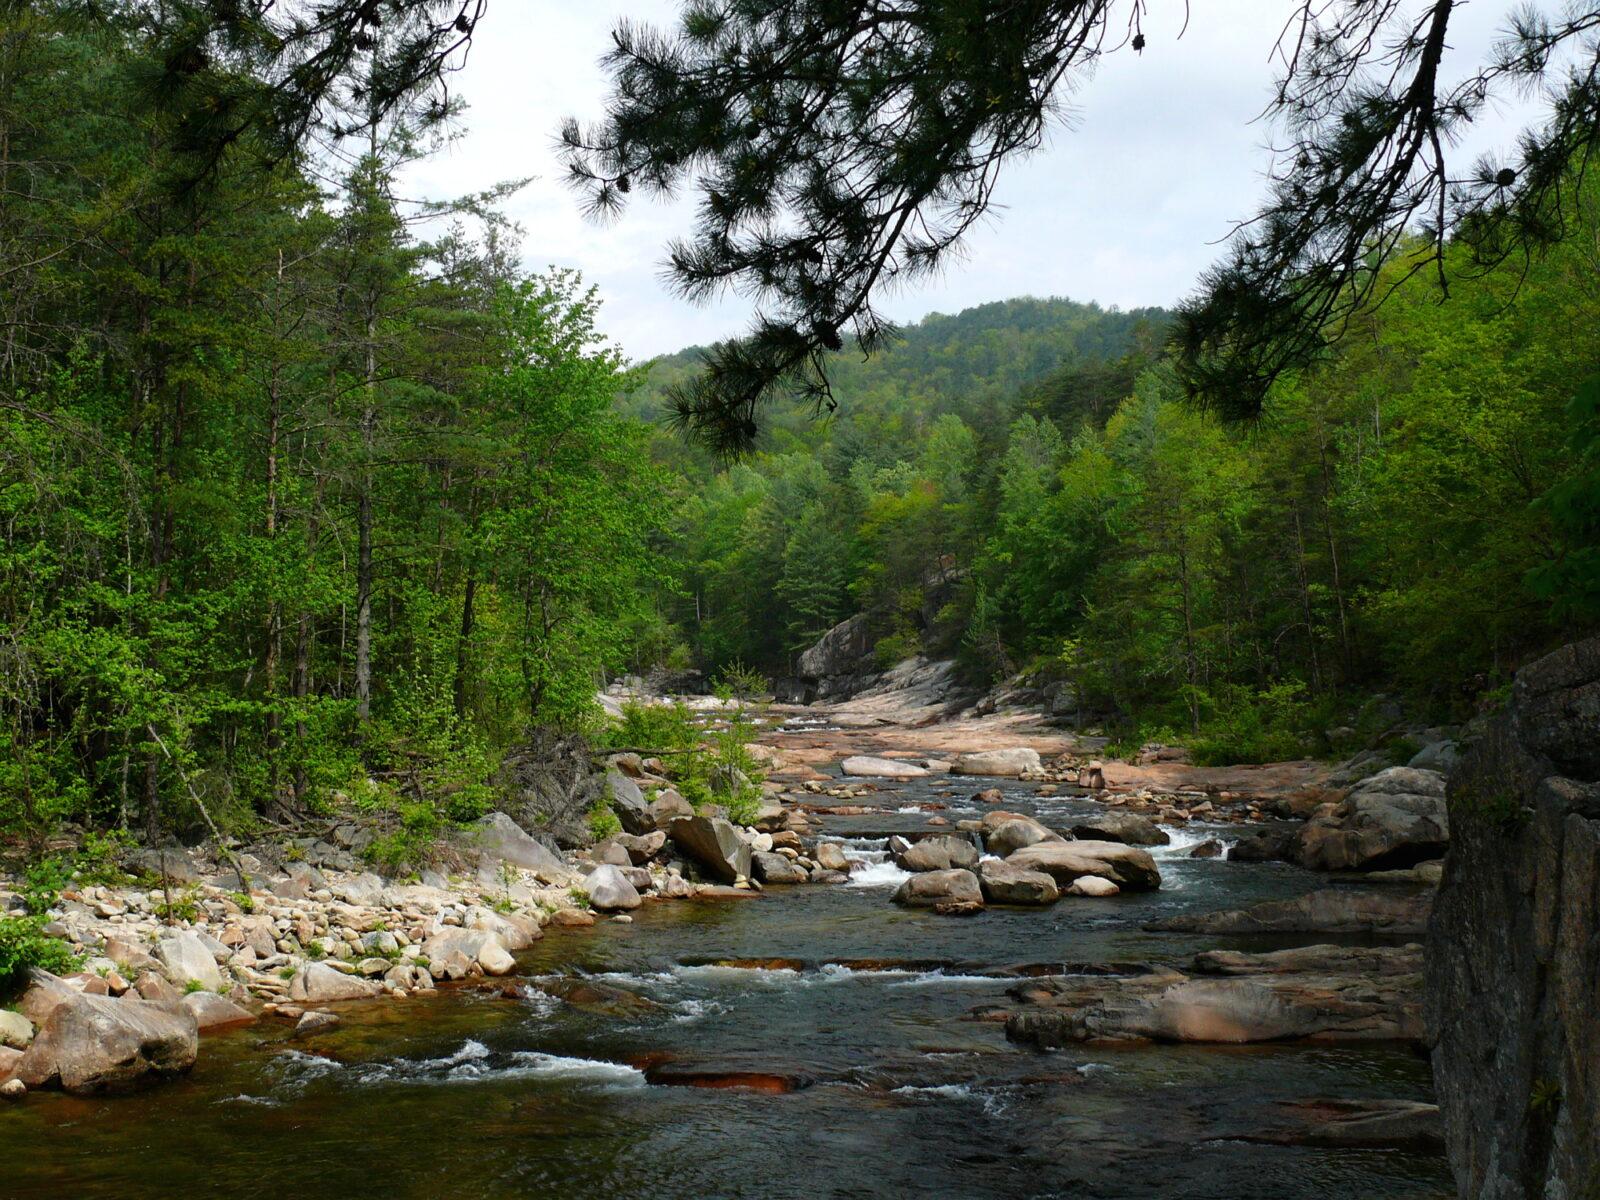 Wilson_Creek-27527-1